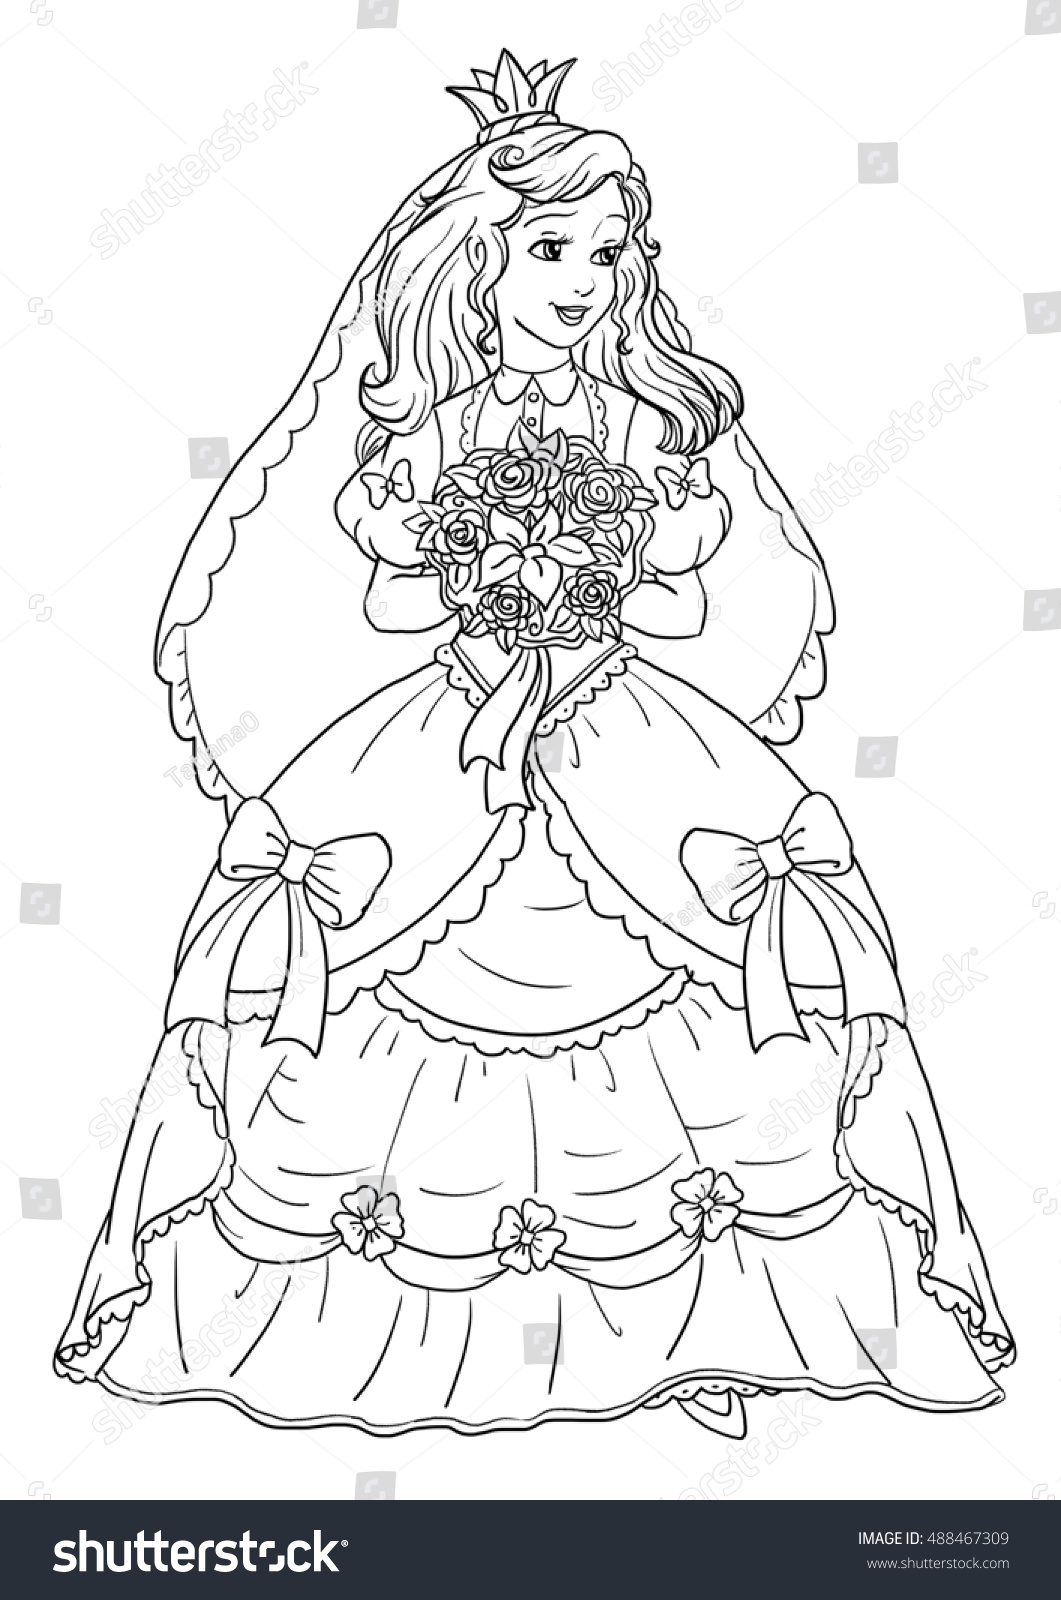 coloring pages princess bride - photo#18